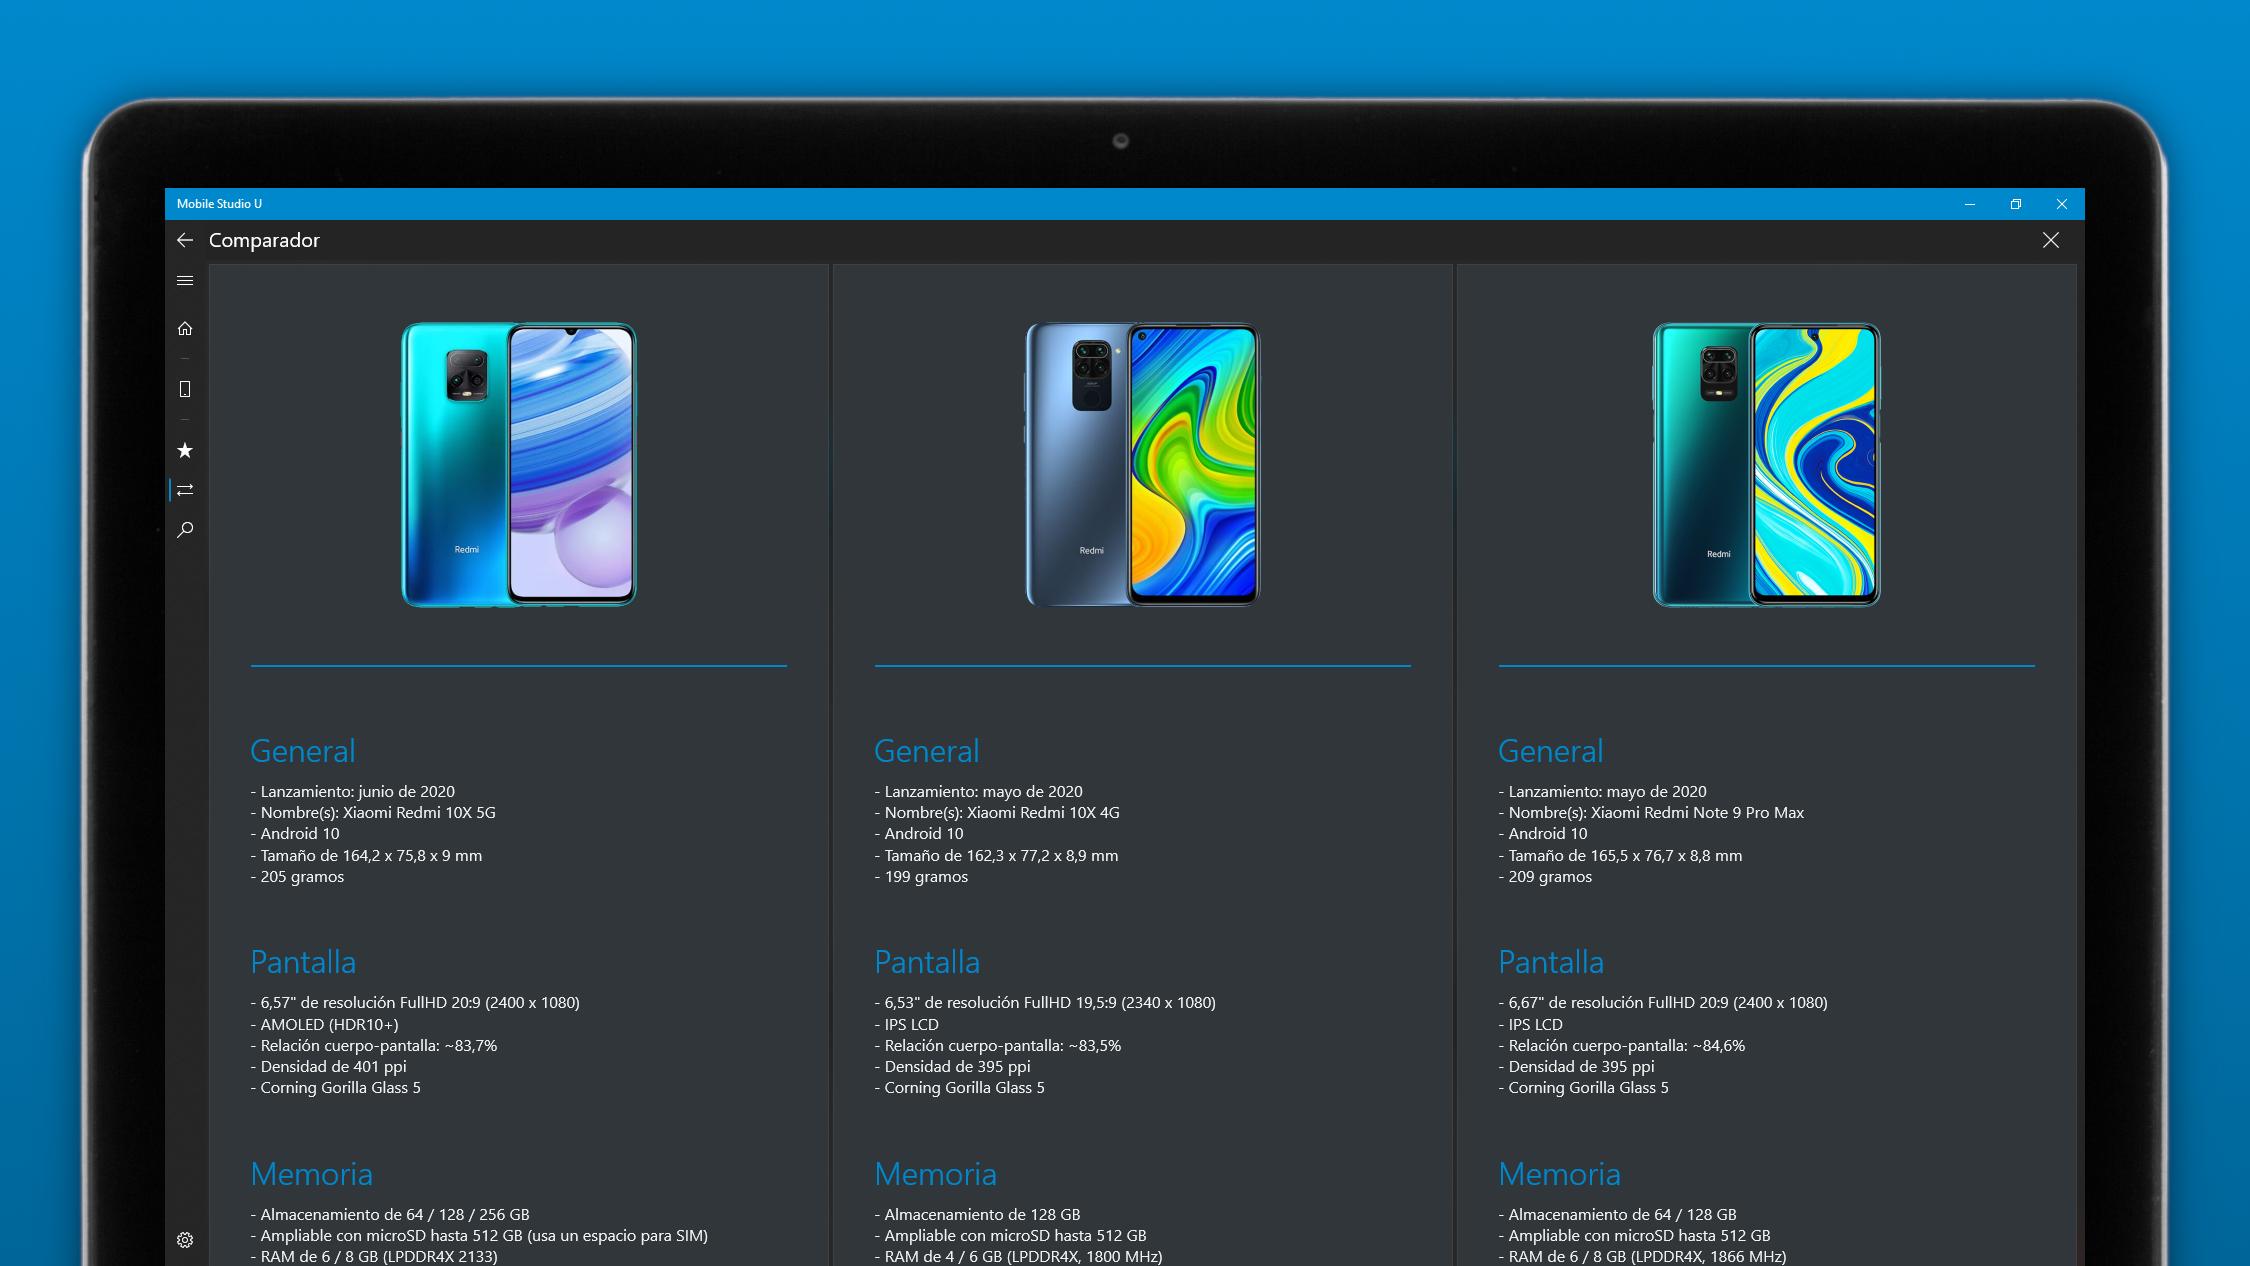 https://uares.blob.core.windows.net/app-mobilestudio/MobileStudio_PC_ES_4.png